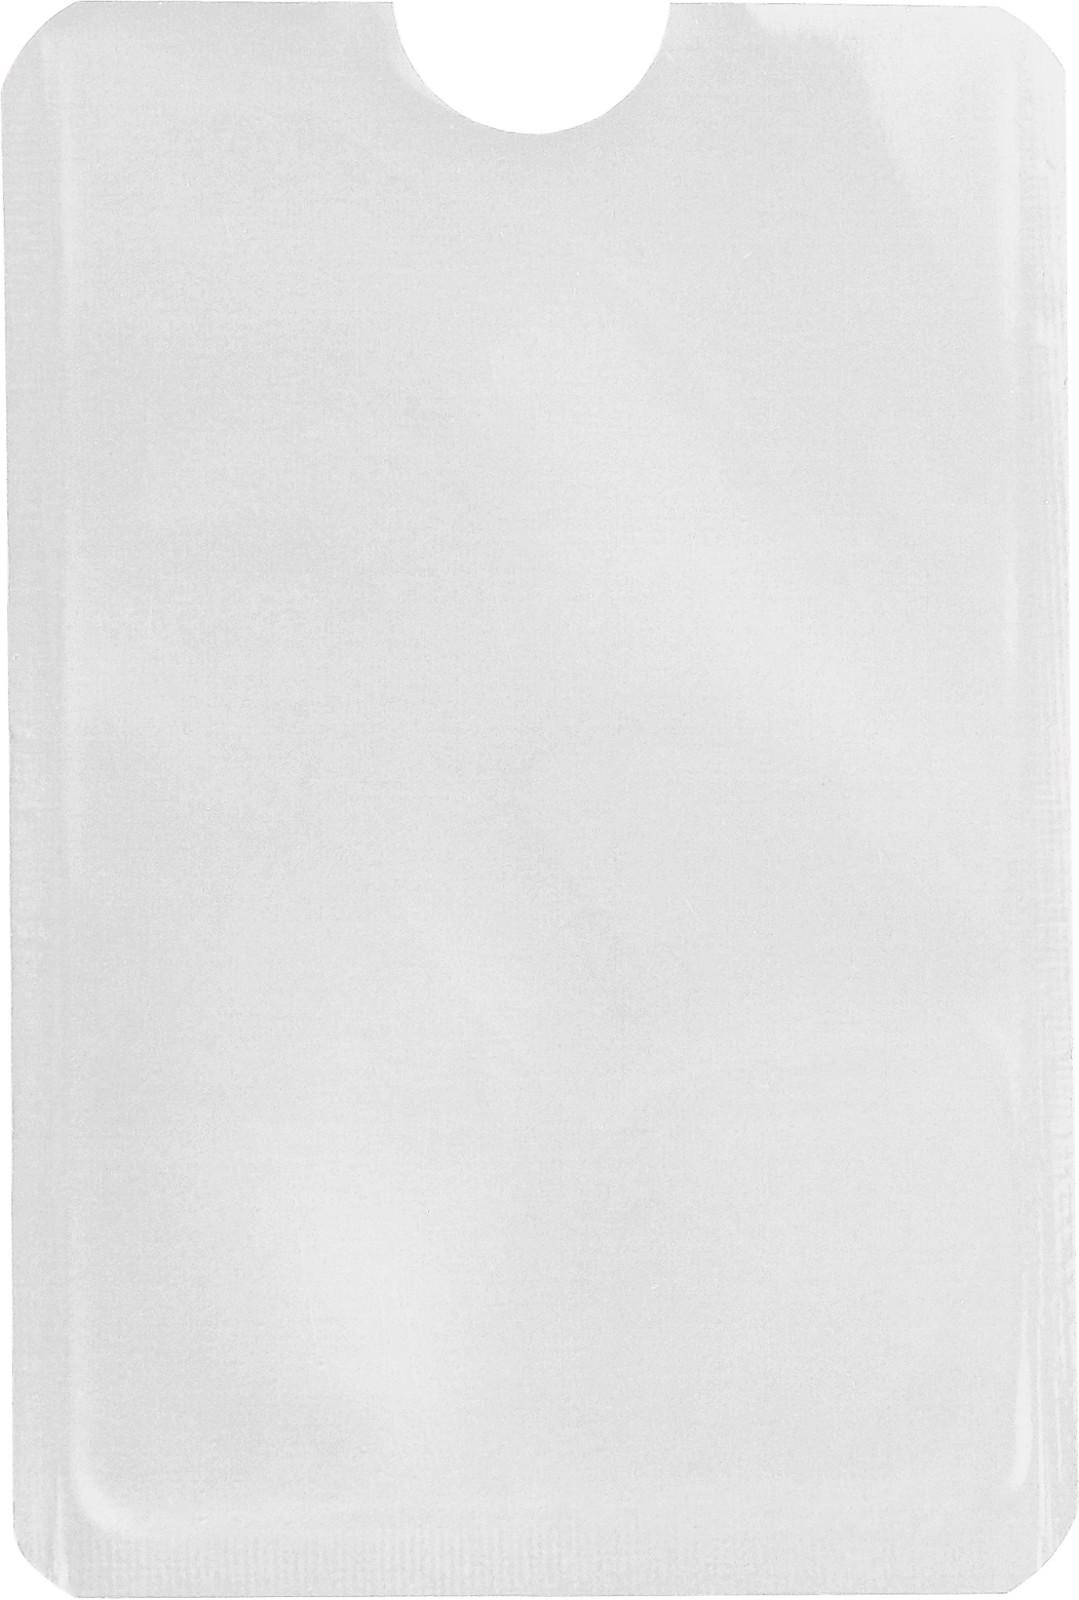 Aluminium card holder - White